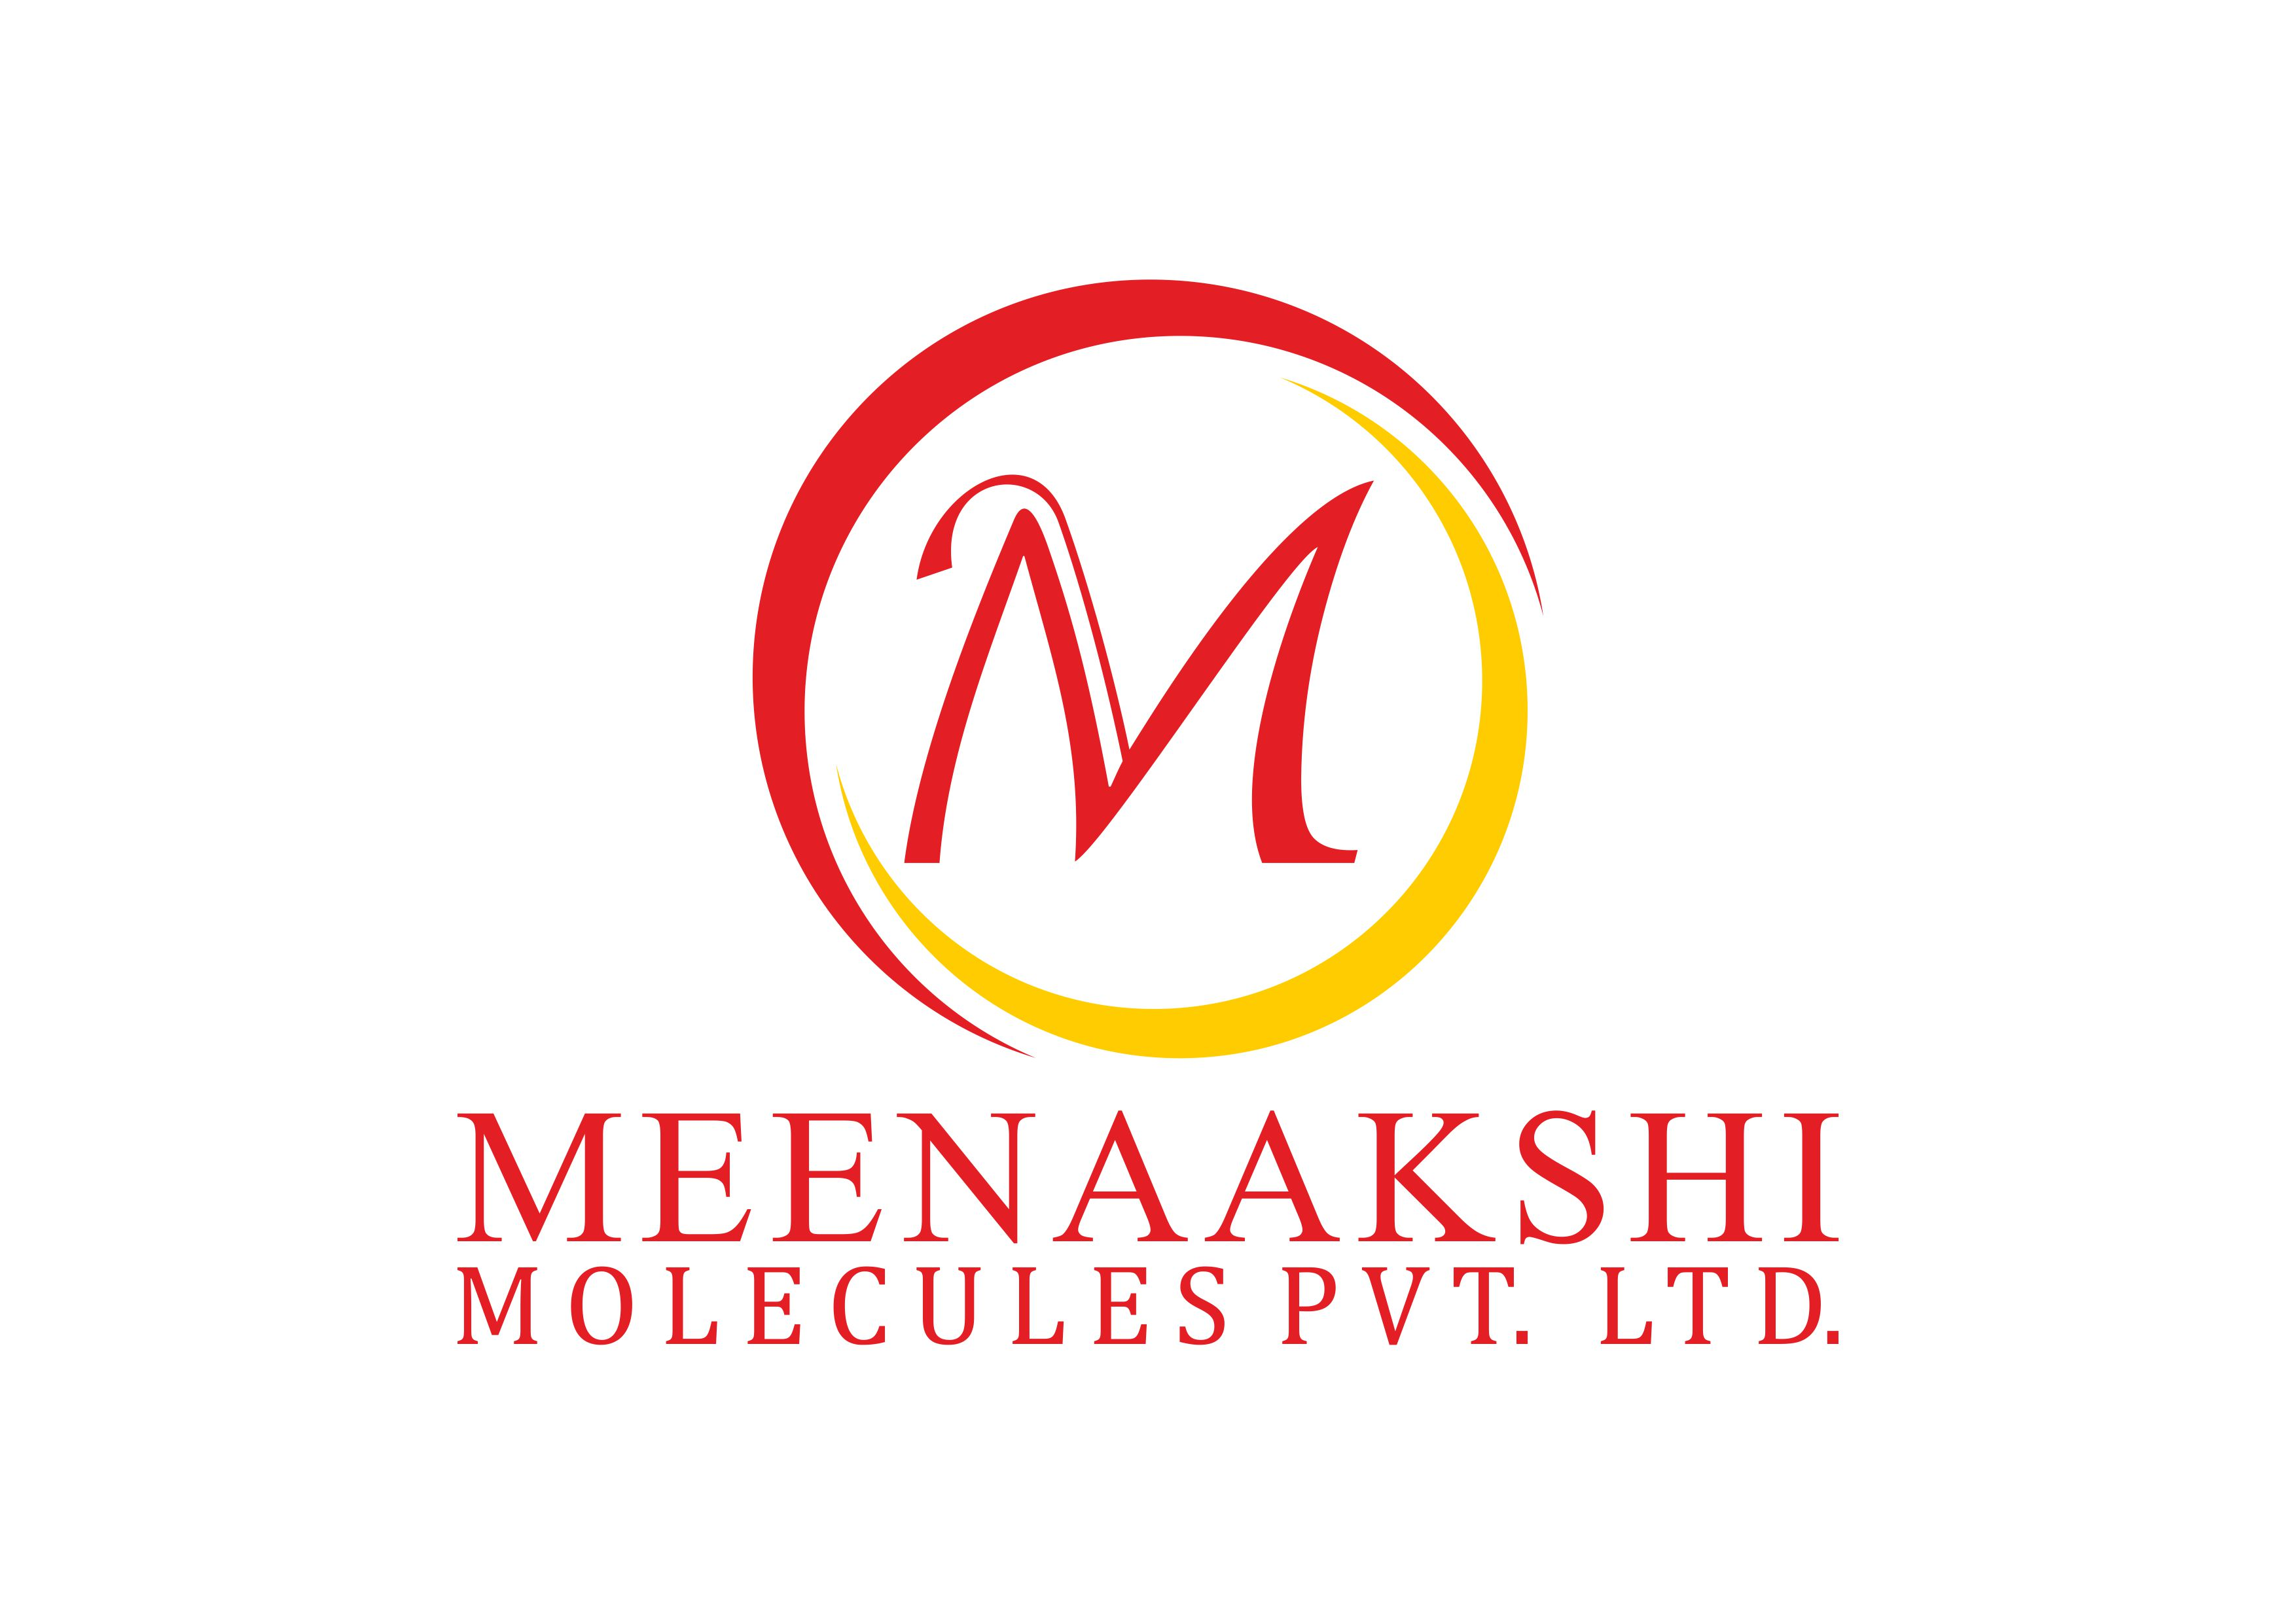 Meenaakshi Molecules Pvt. Ltd.